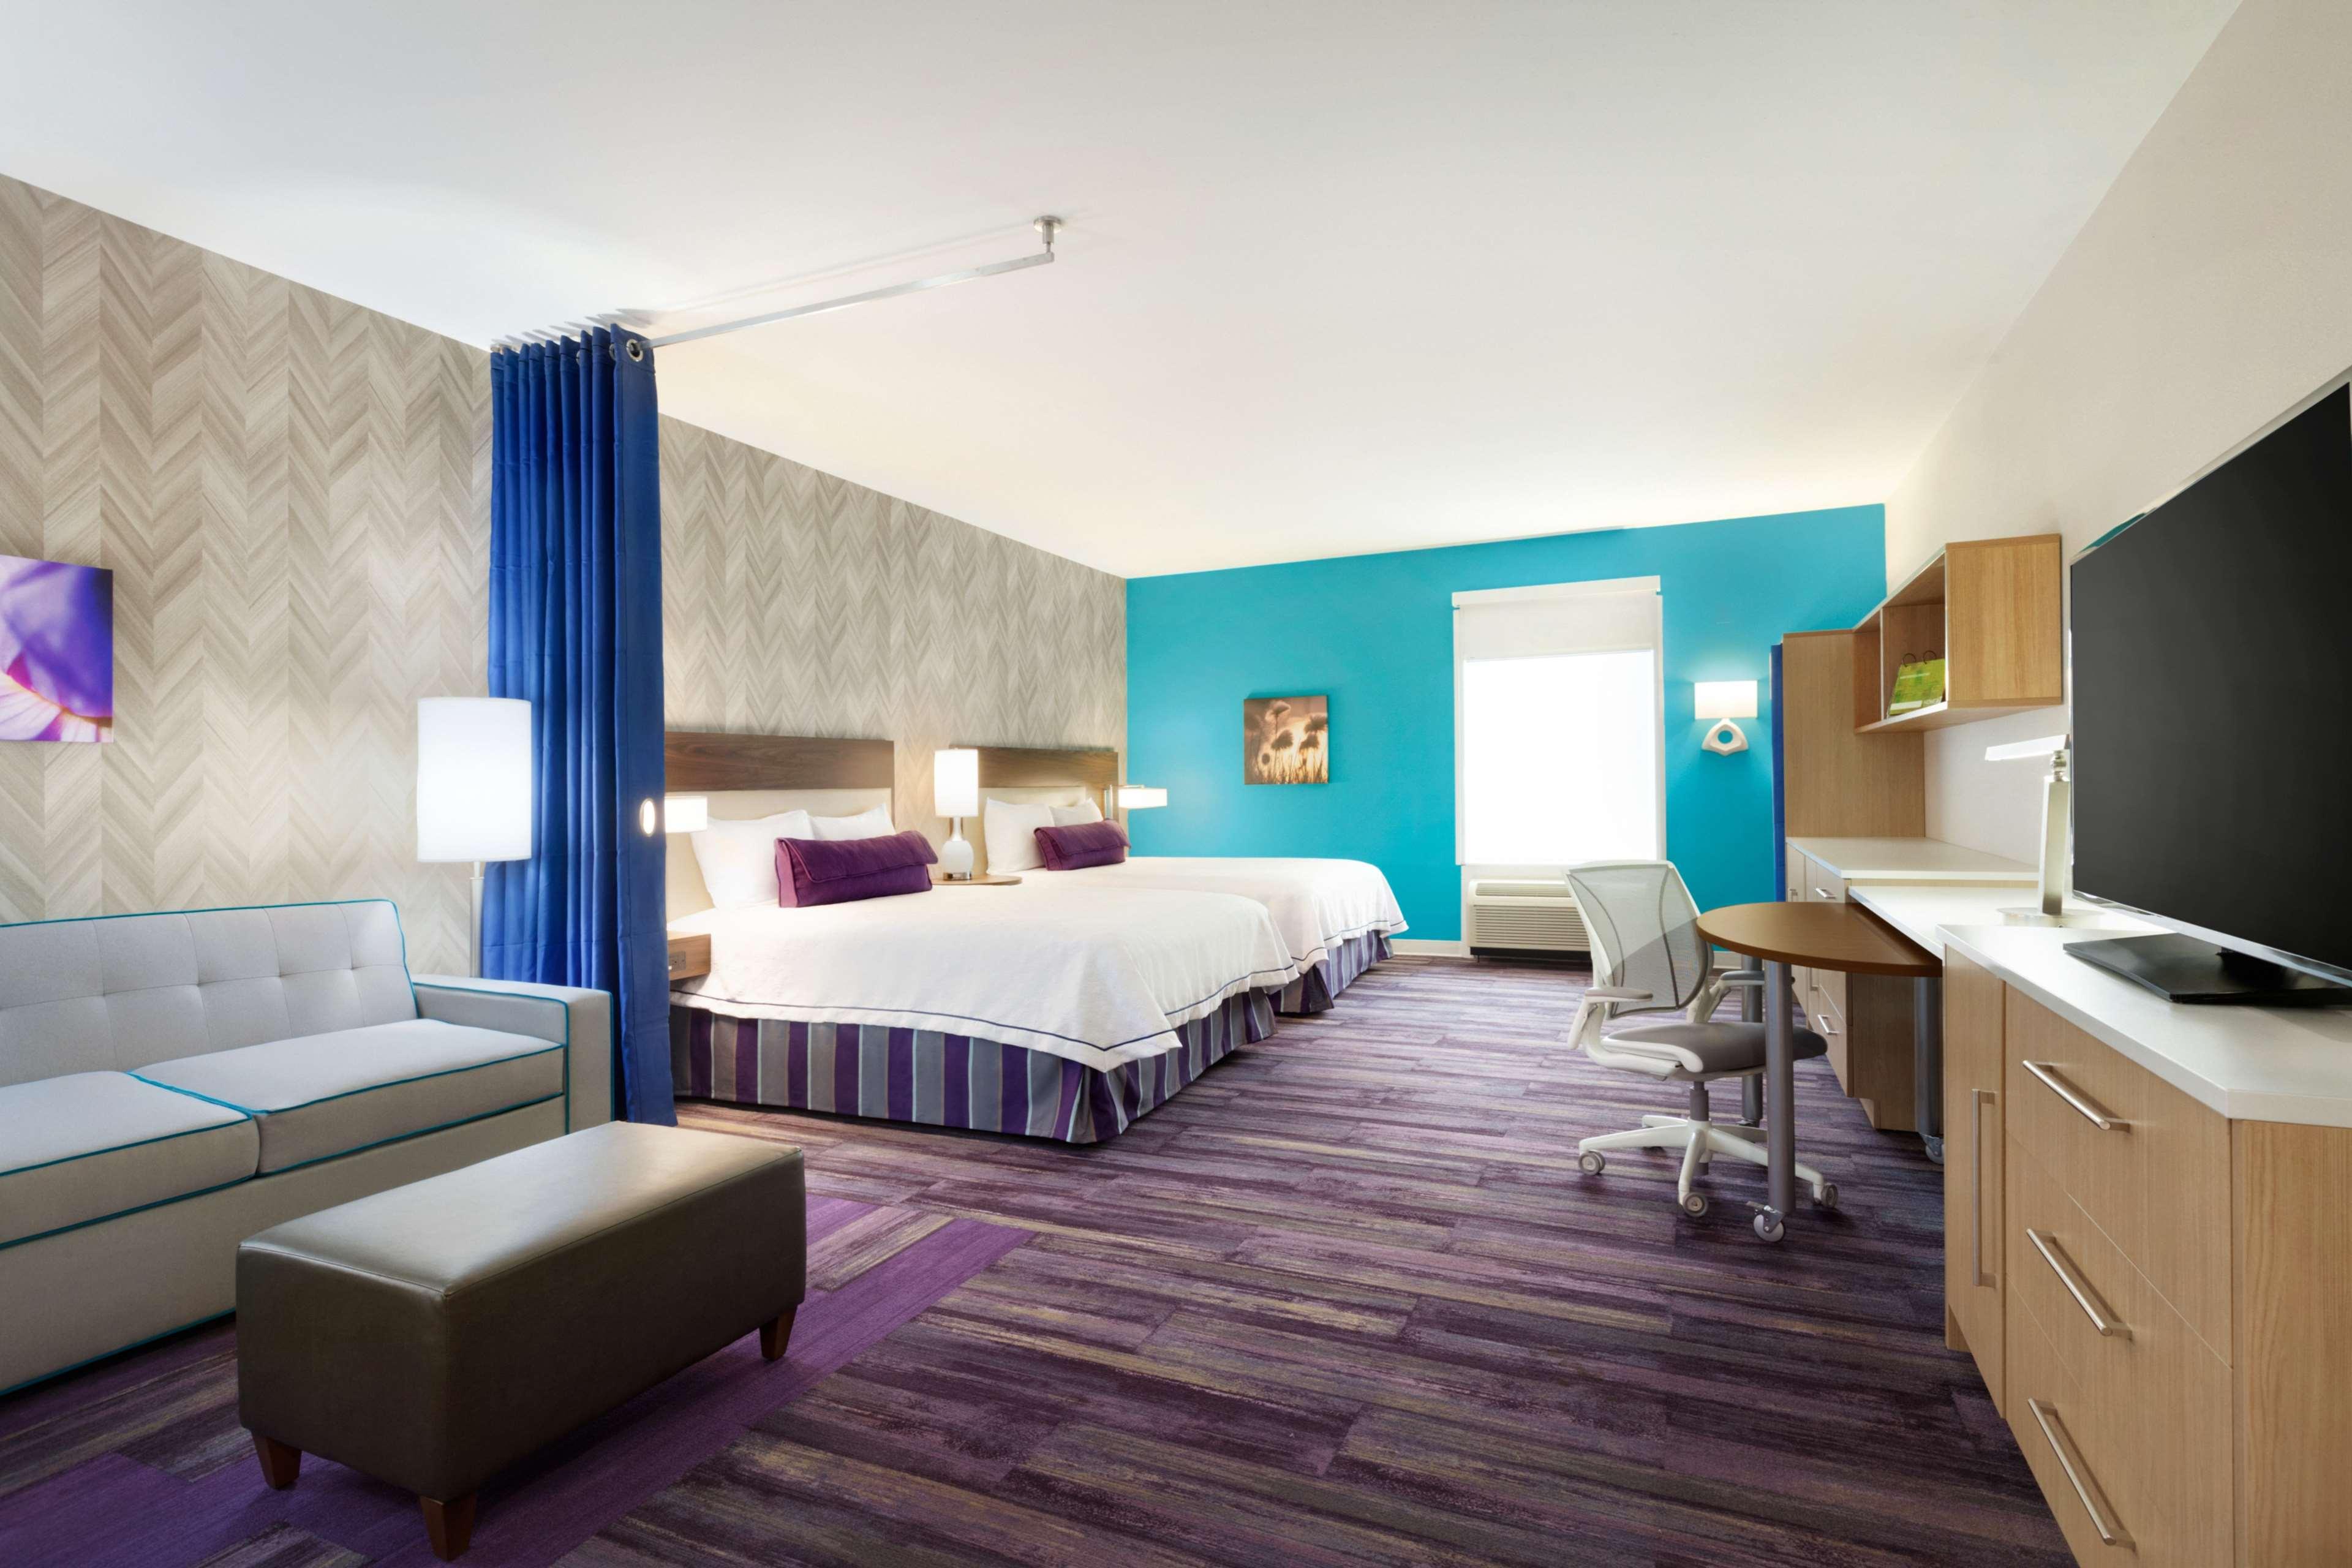 Home2 Suites by Hilton West Monroe image 10